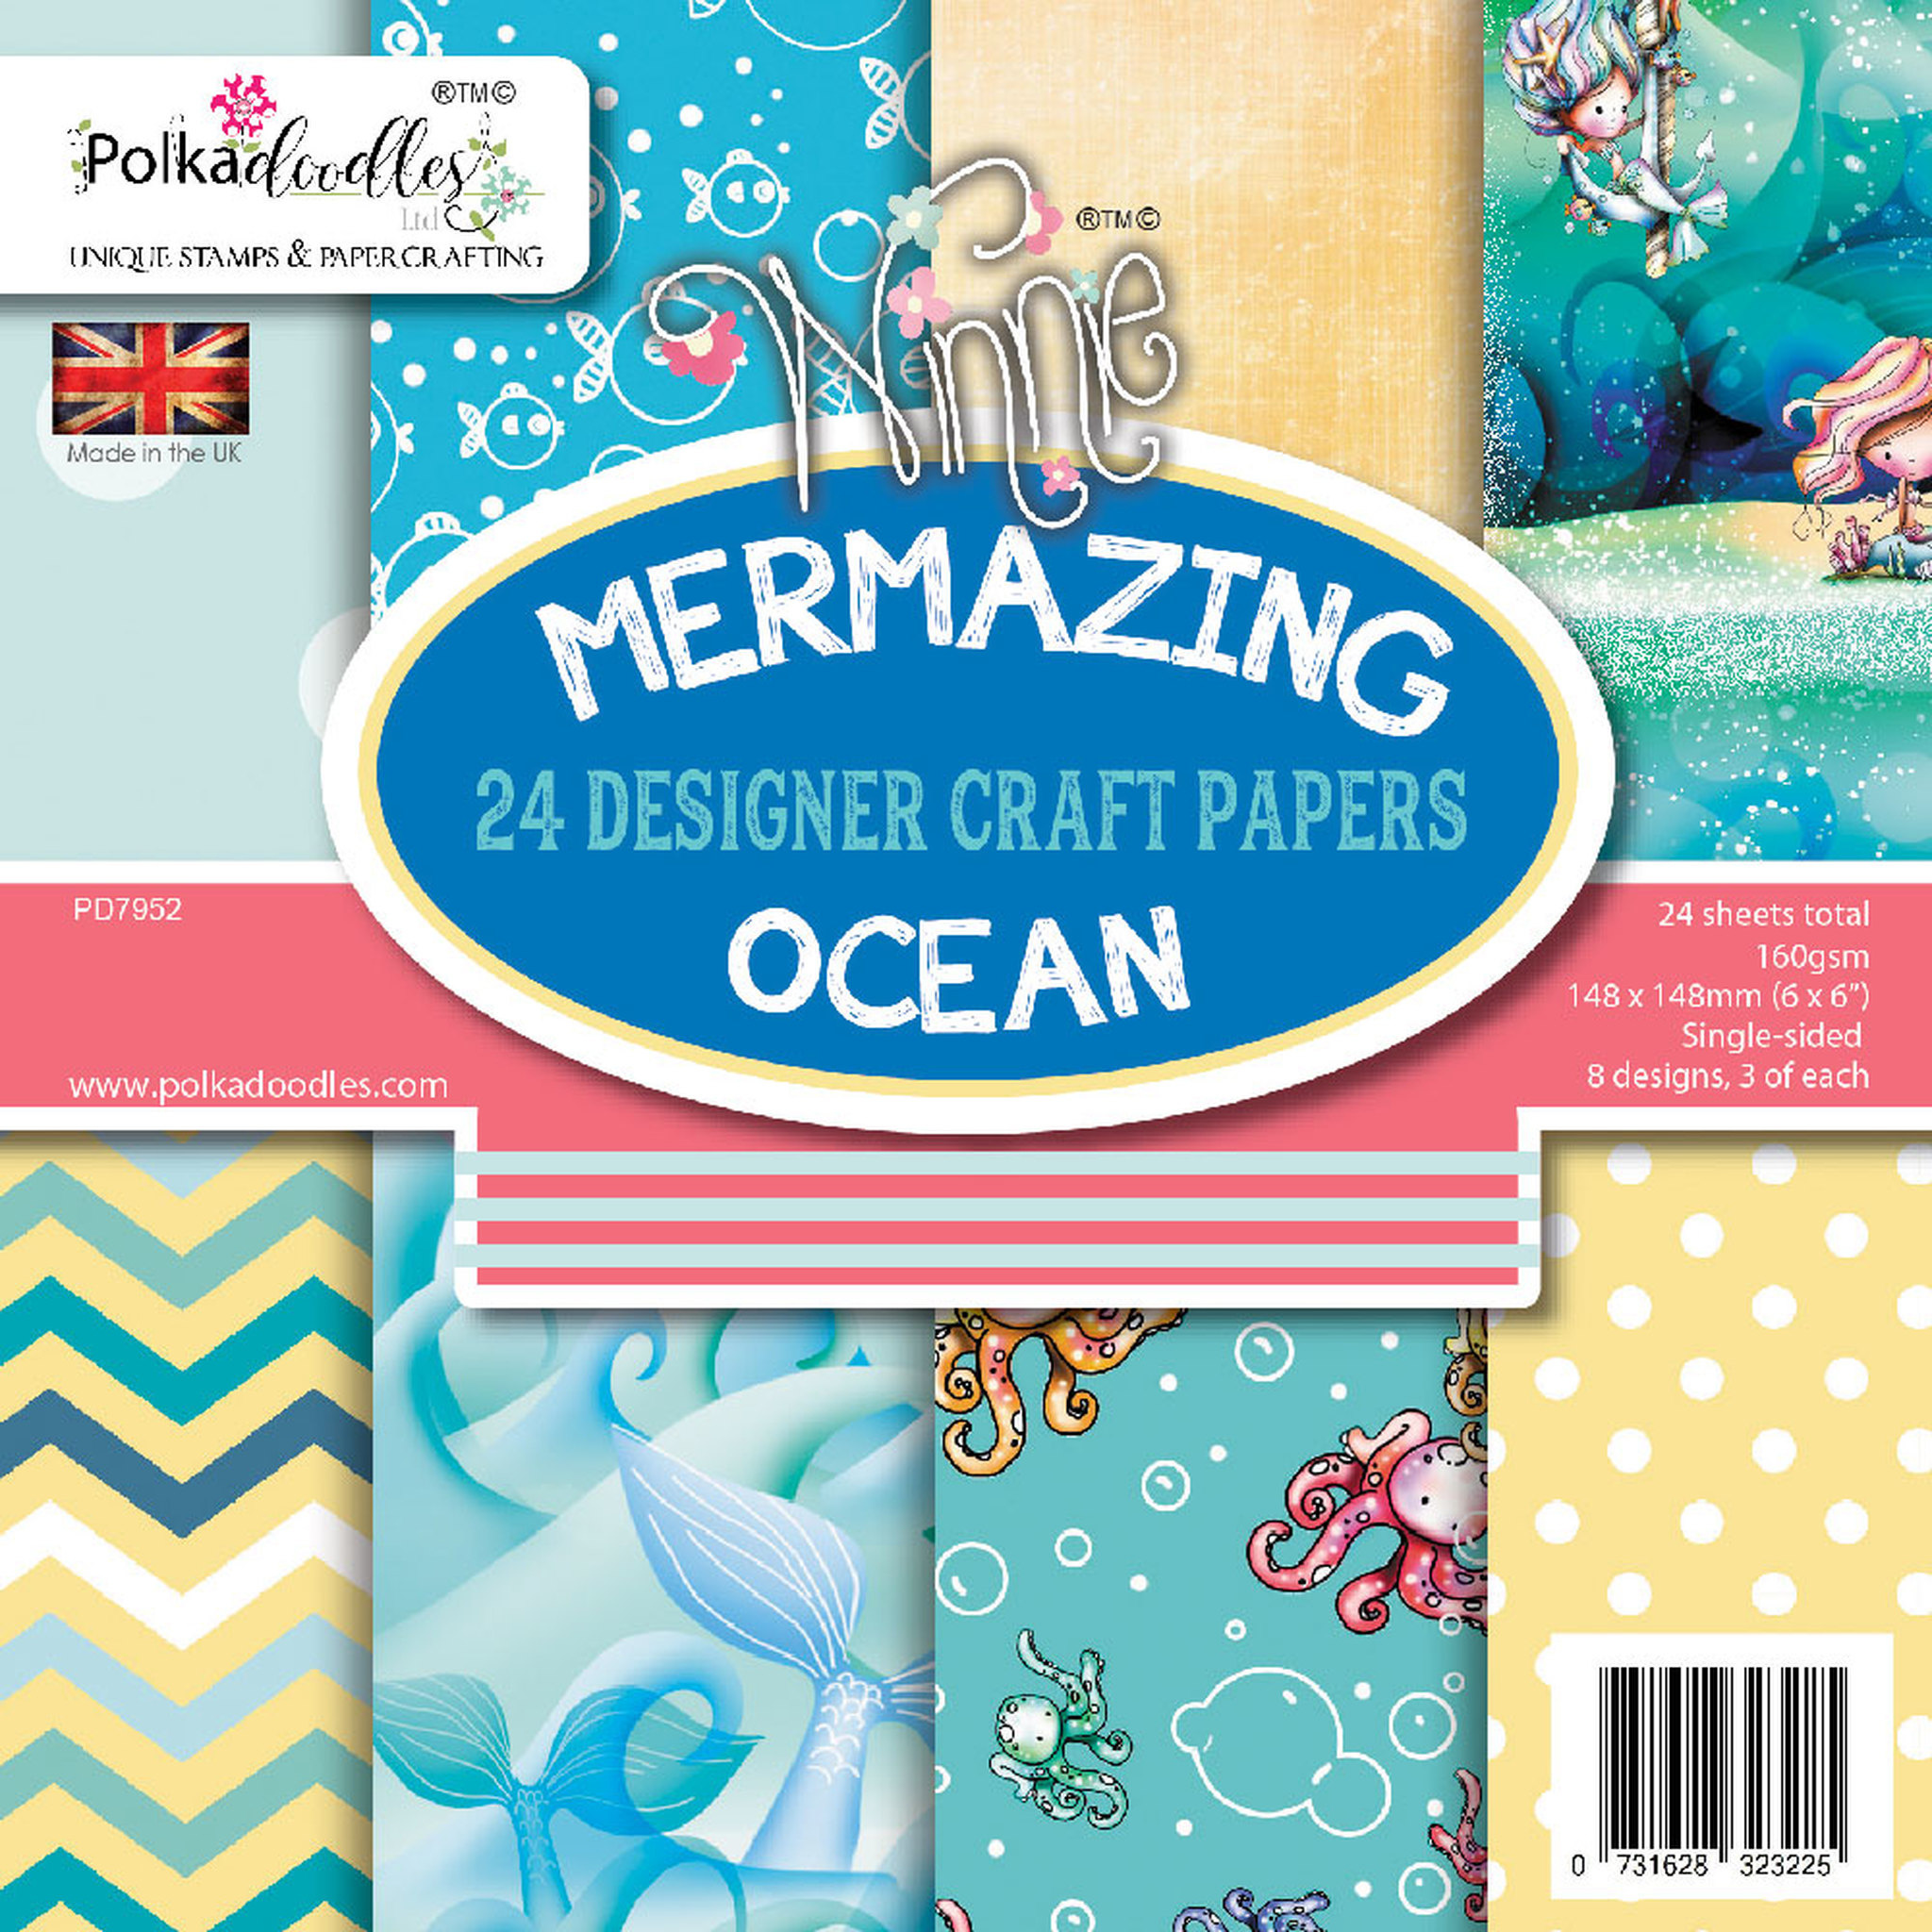 Mermazing Ocean Paper Pack 6x6 Inch (PD7952) - Craftlines